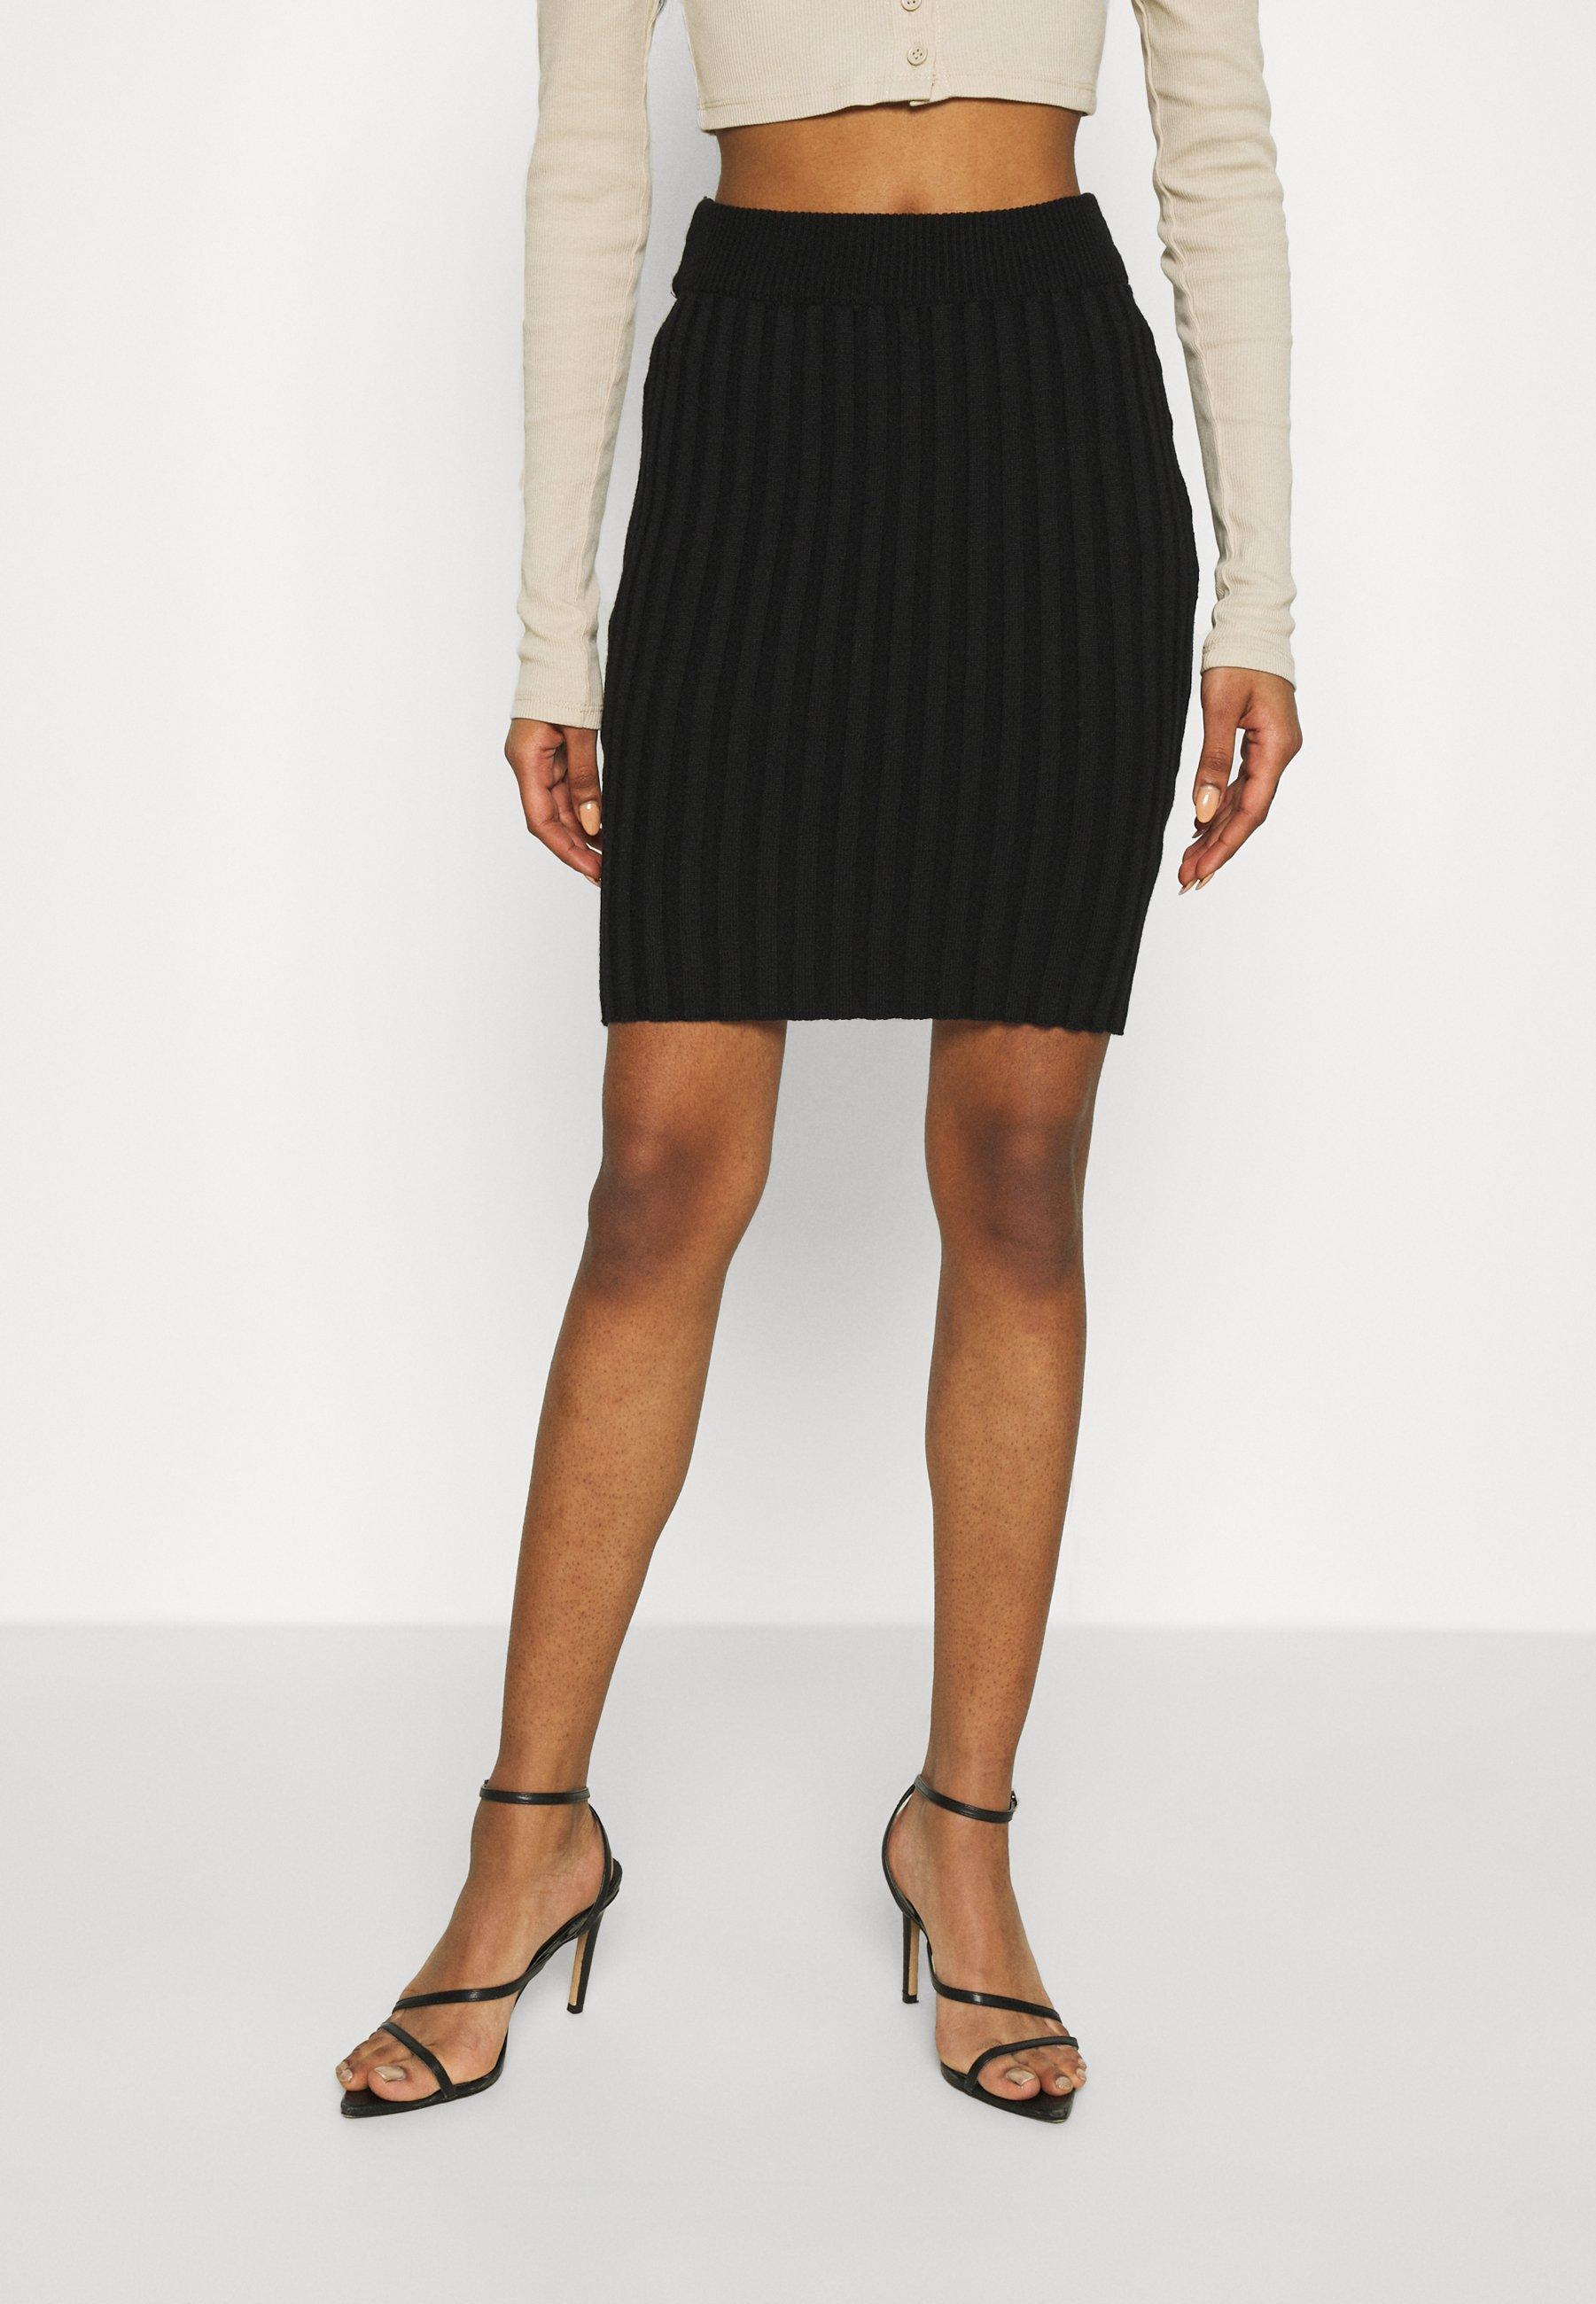 Femme ZARRAH LOUNGE SKIRT - Minijupe